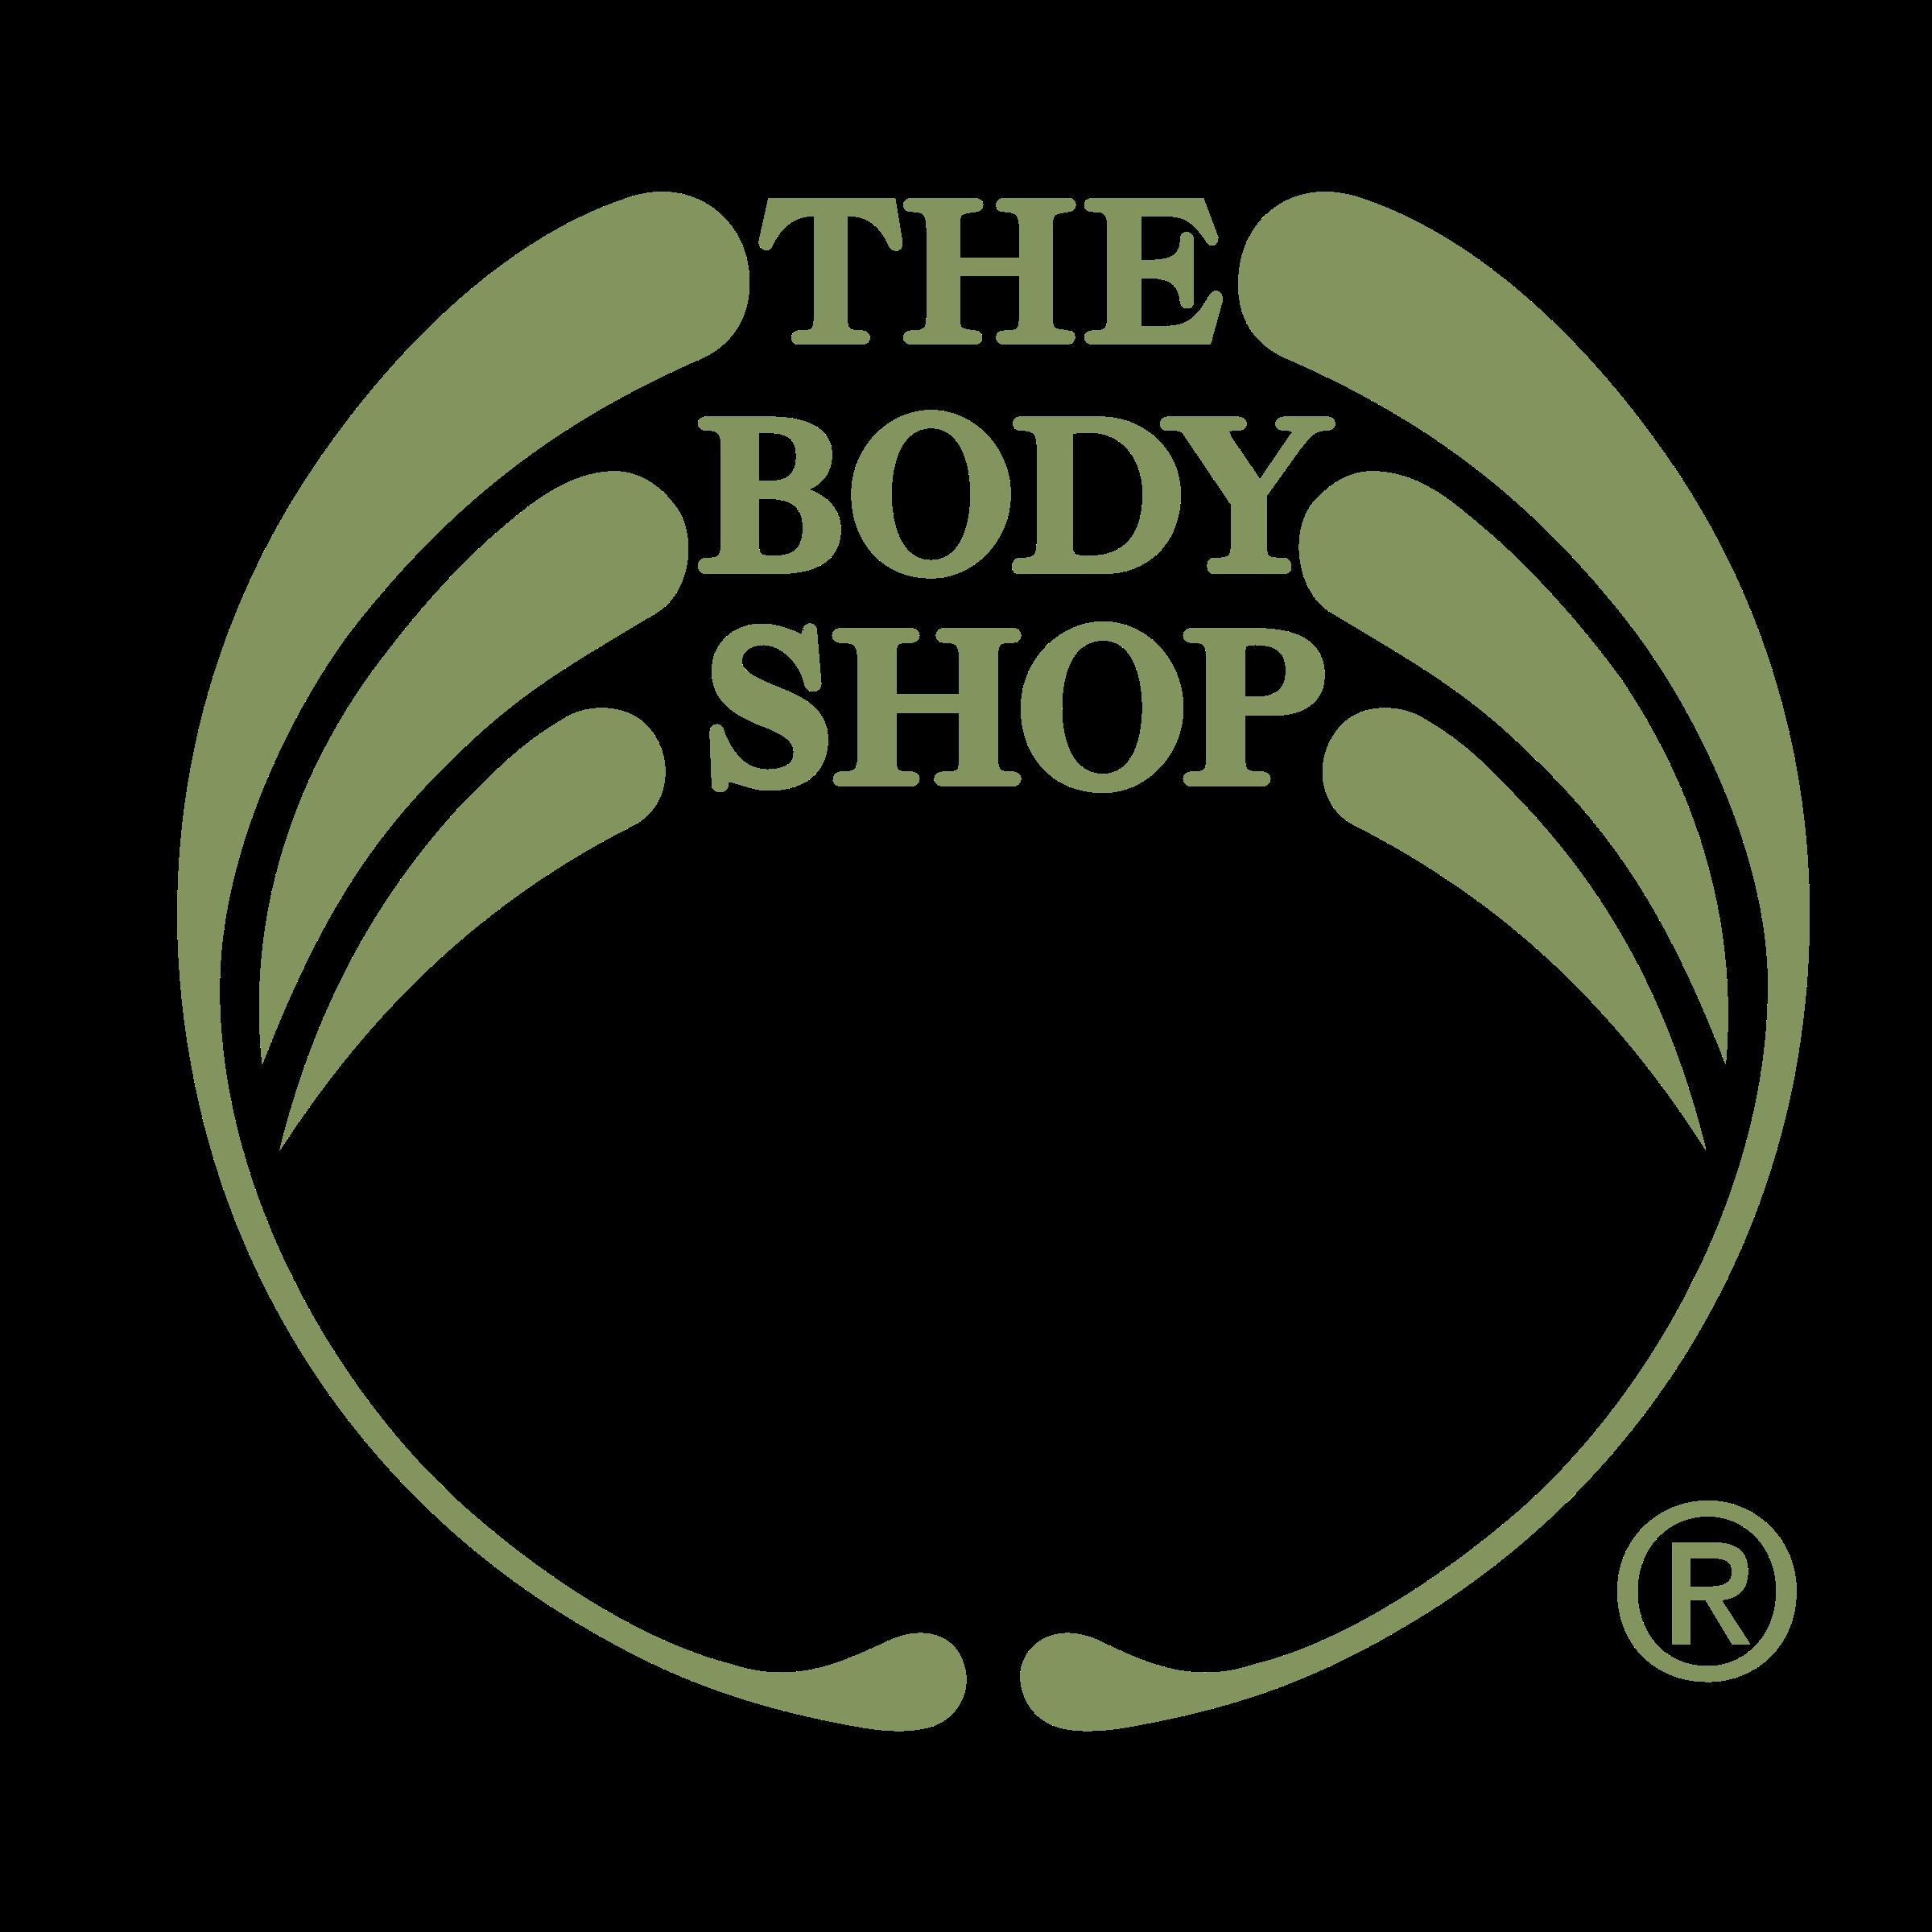 The Body Shop Logo PNG Transparent & SVG Vector.